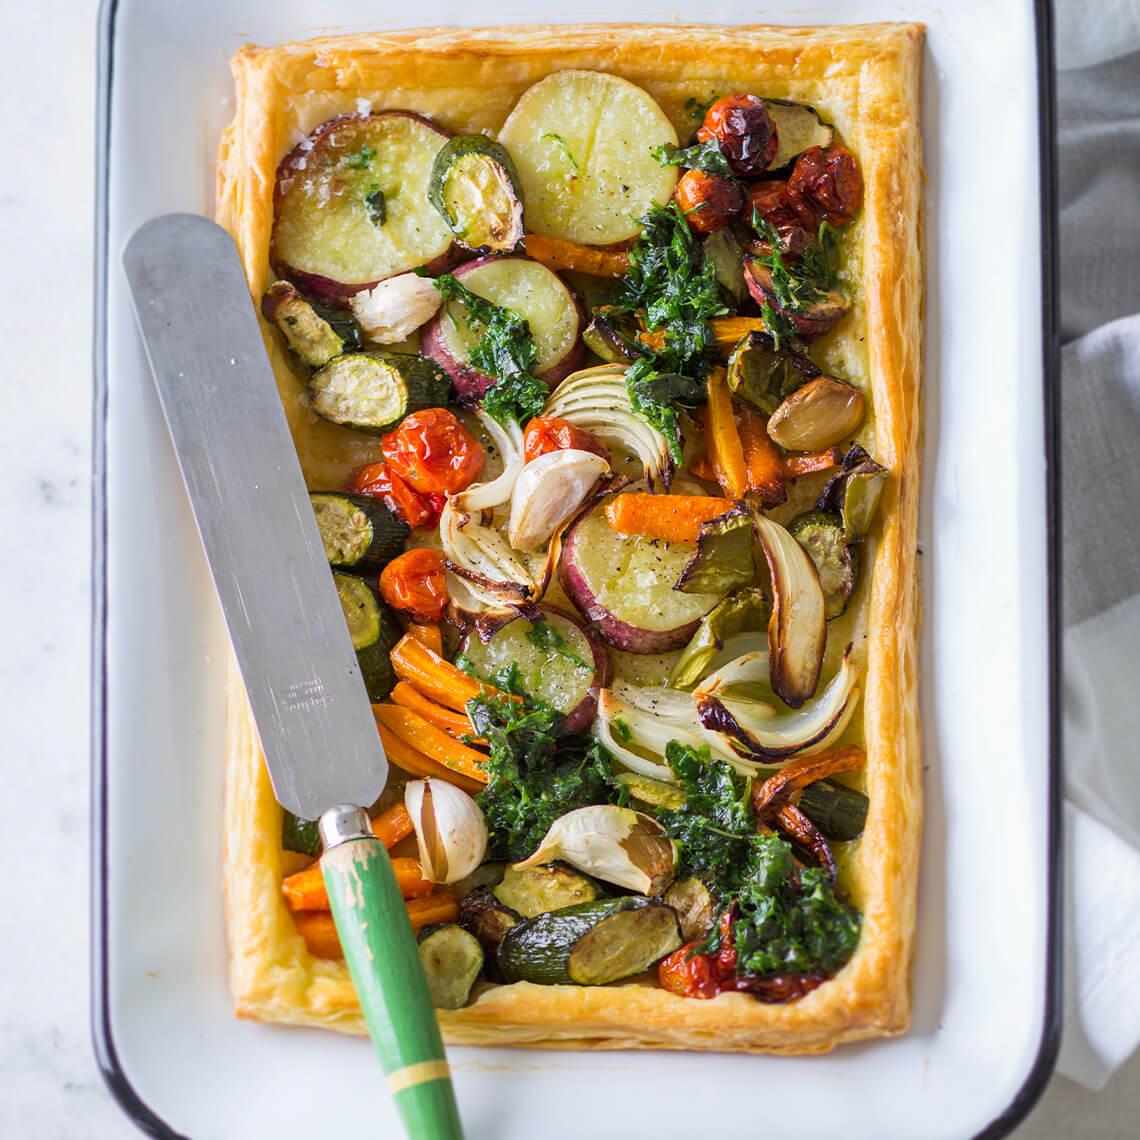 Roast-veg tart with herb oil